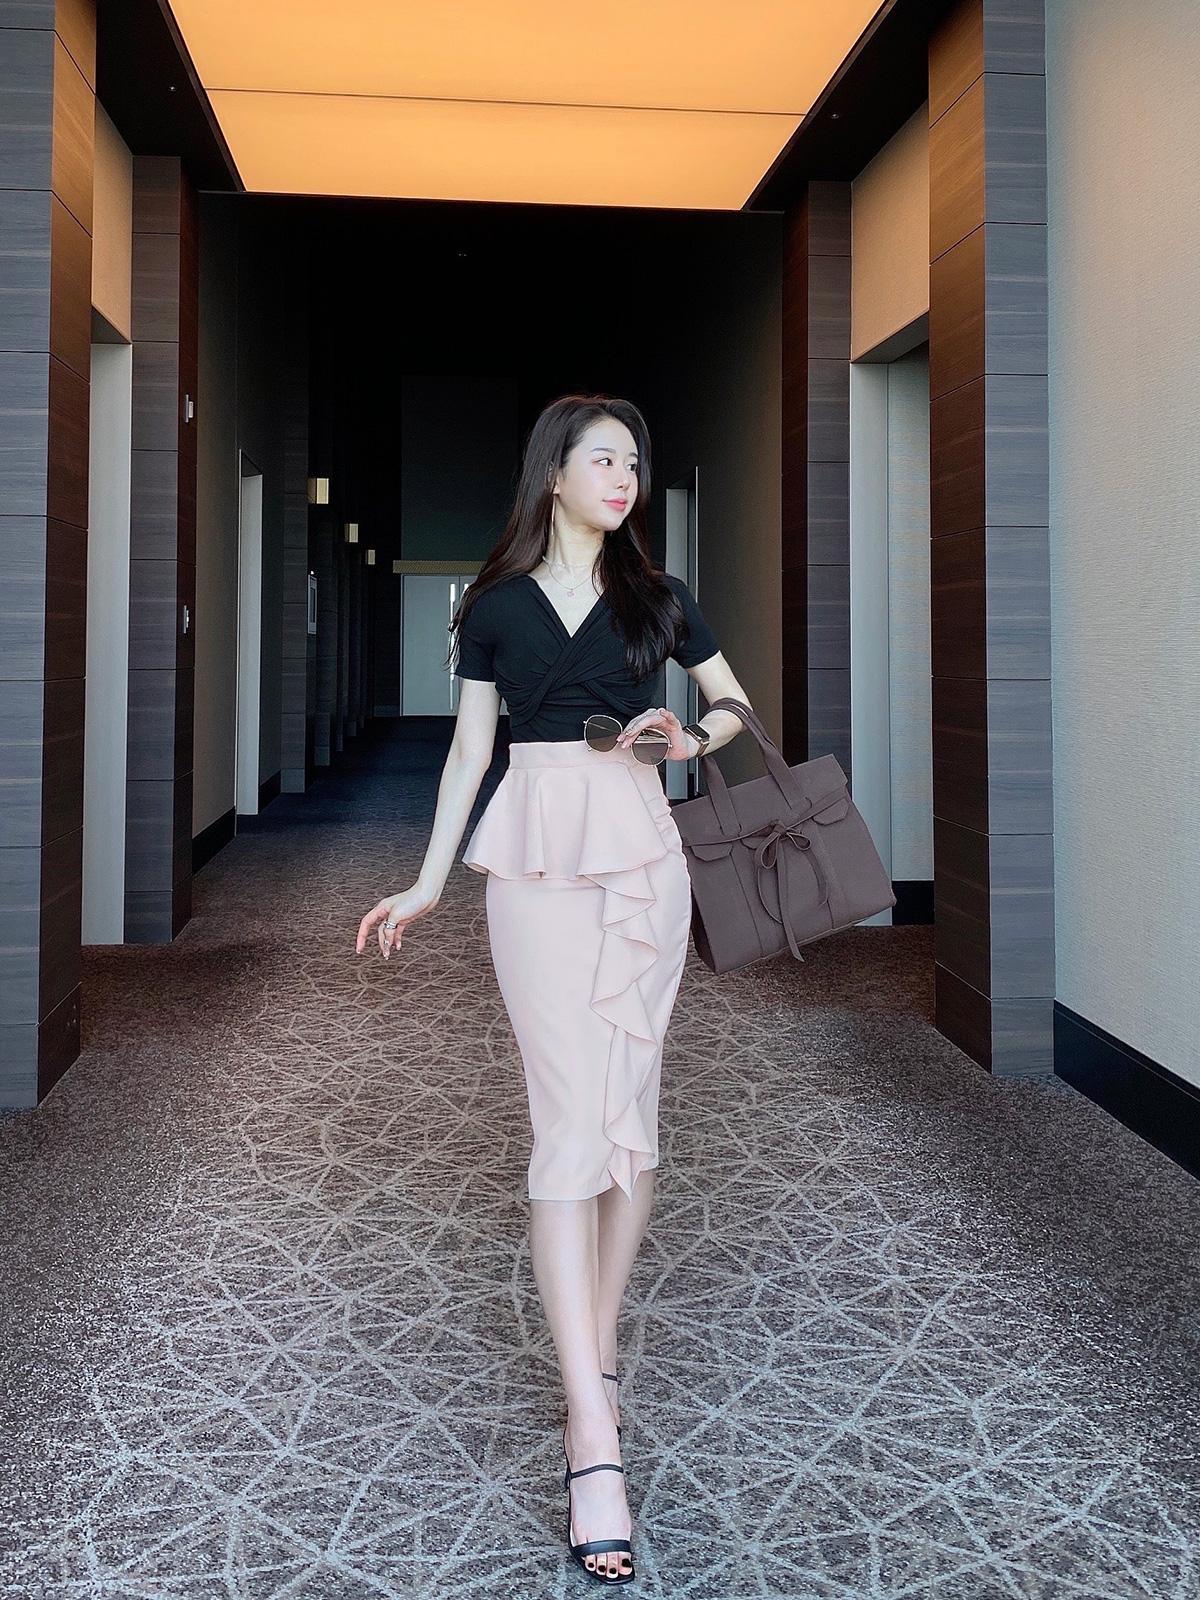 ladyペプラムタイトスカート カラー:ブラック、ピンクベージュ